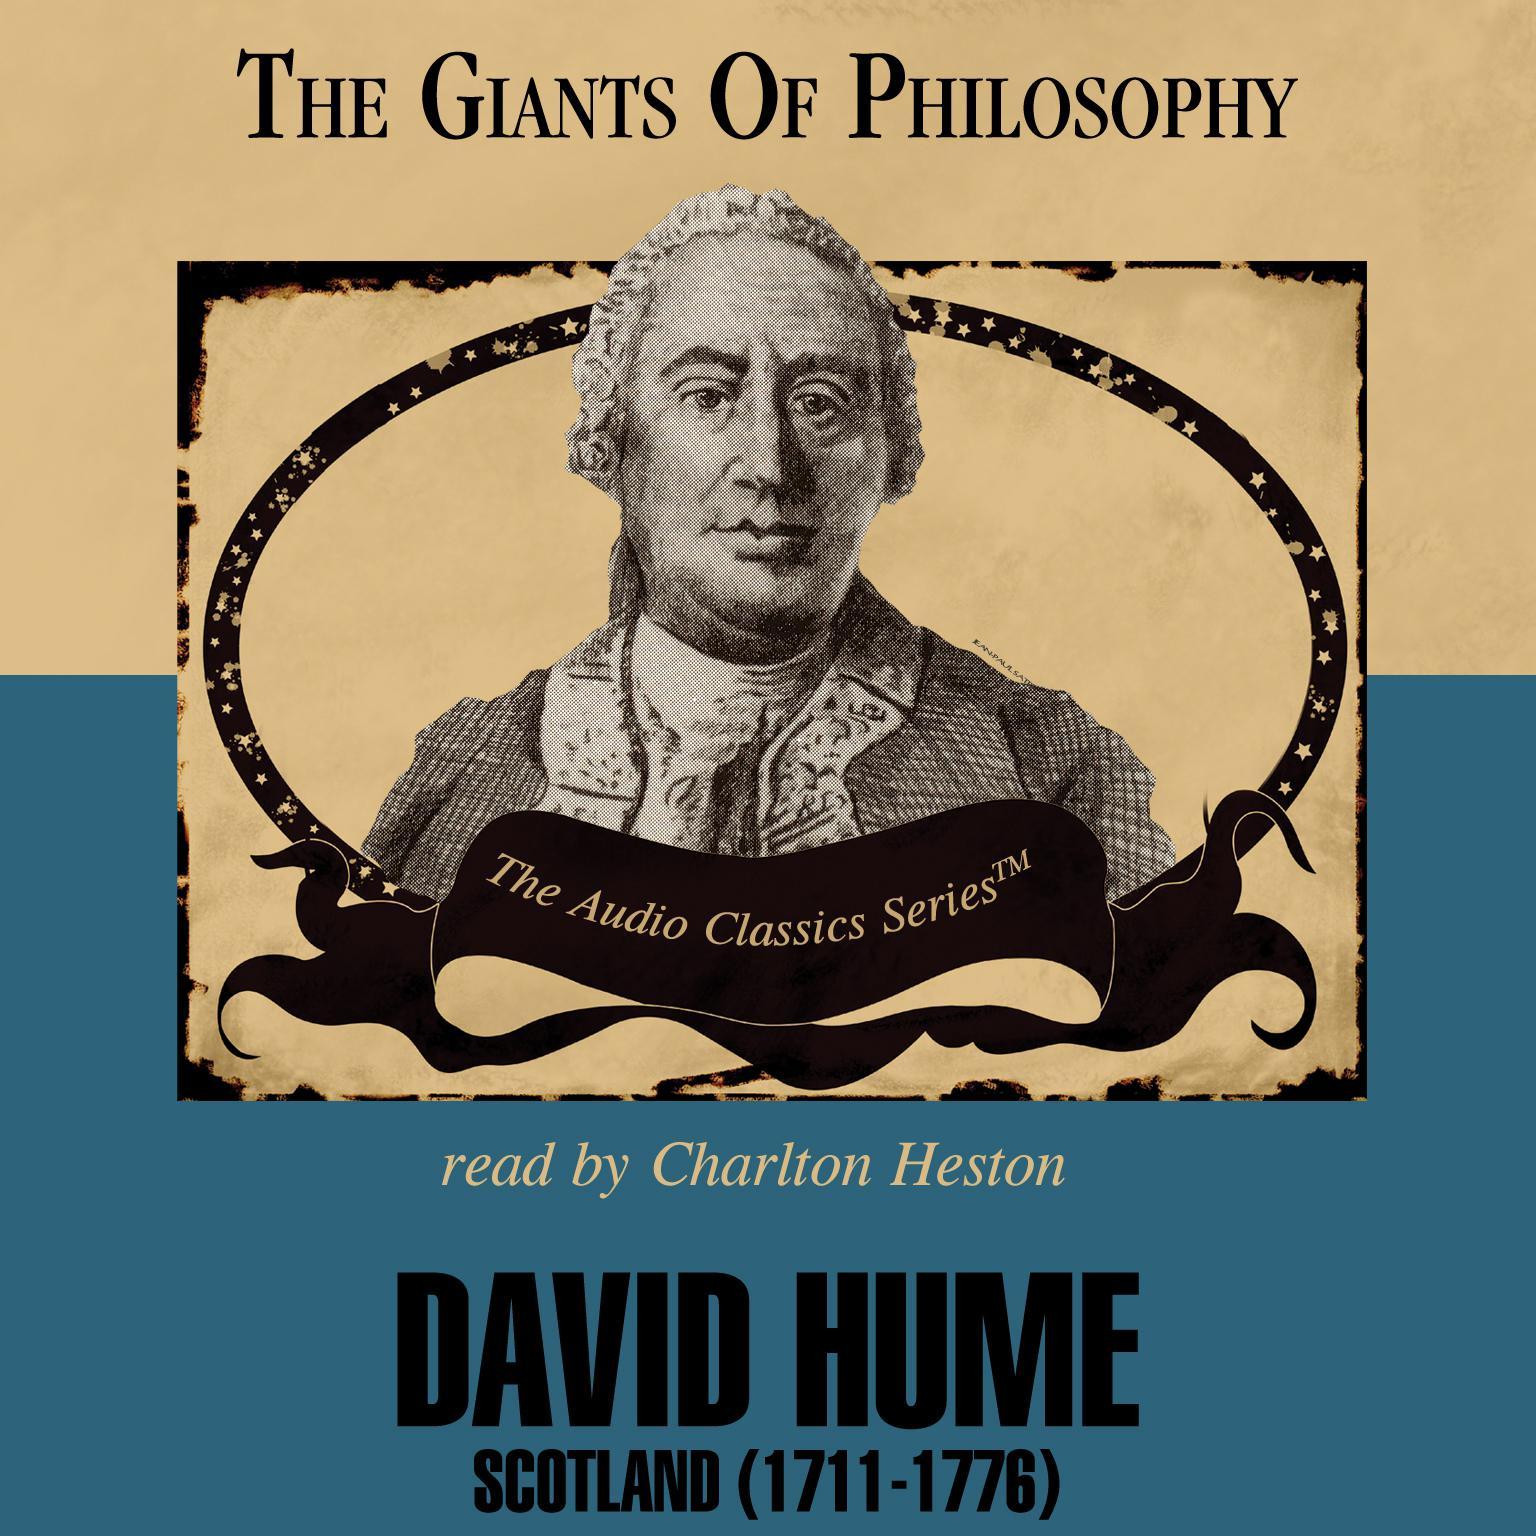 Printable David Hume: Scotland (1711-1776) Audiobook Cover Art